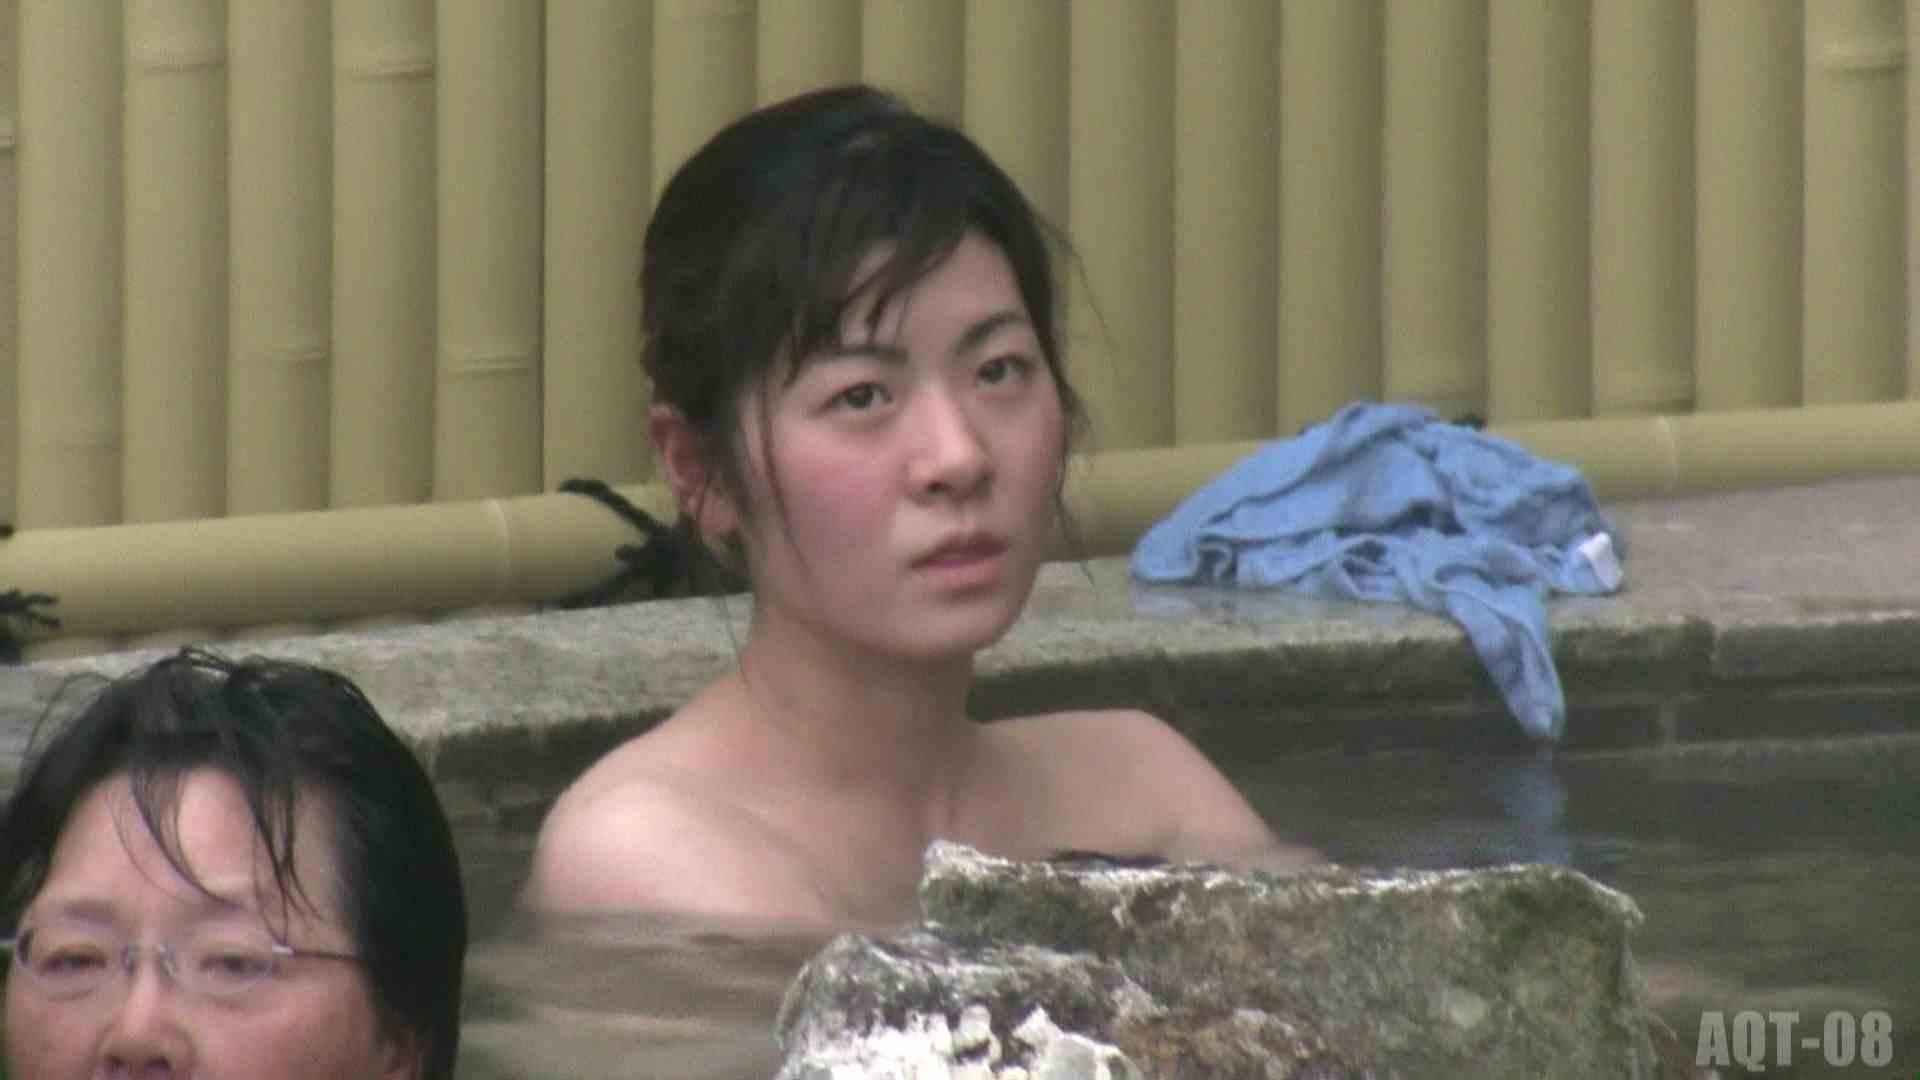 Aquaな露天風呂Vol.774 HなOL AV無料動画キャプチャ 83pic 74